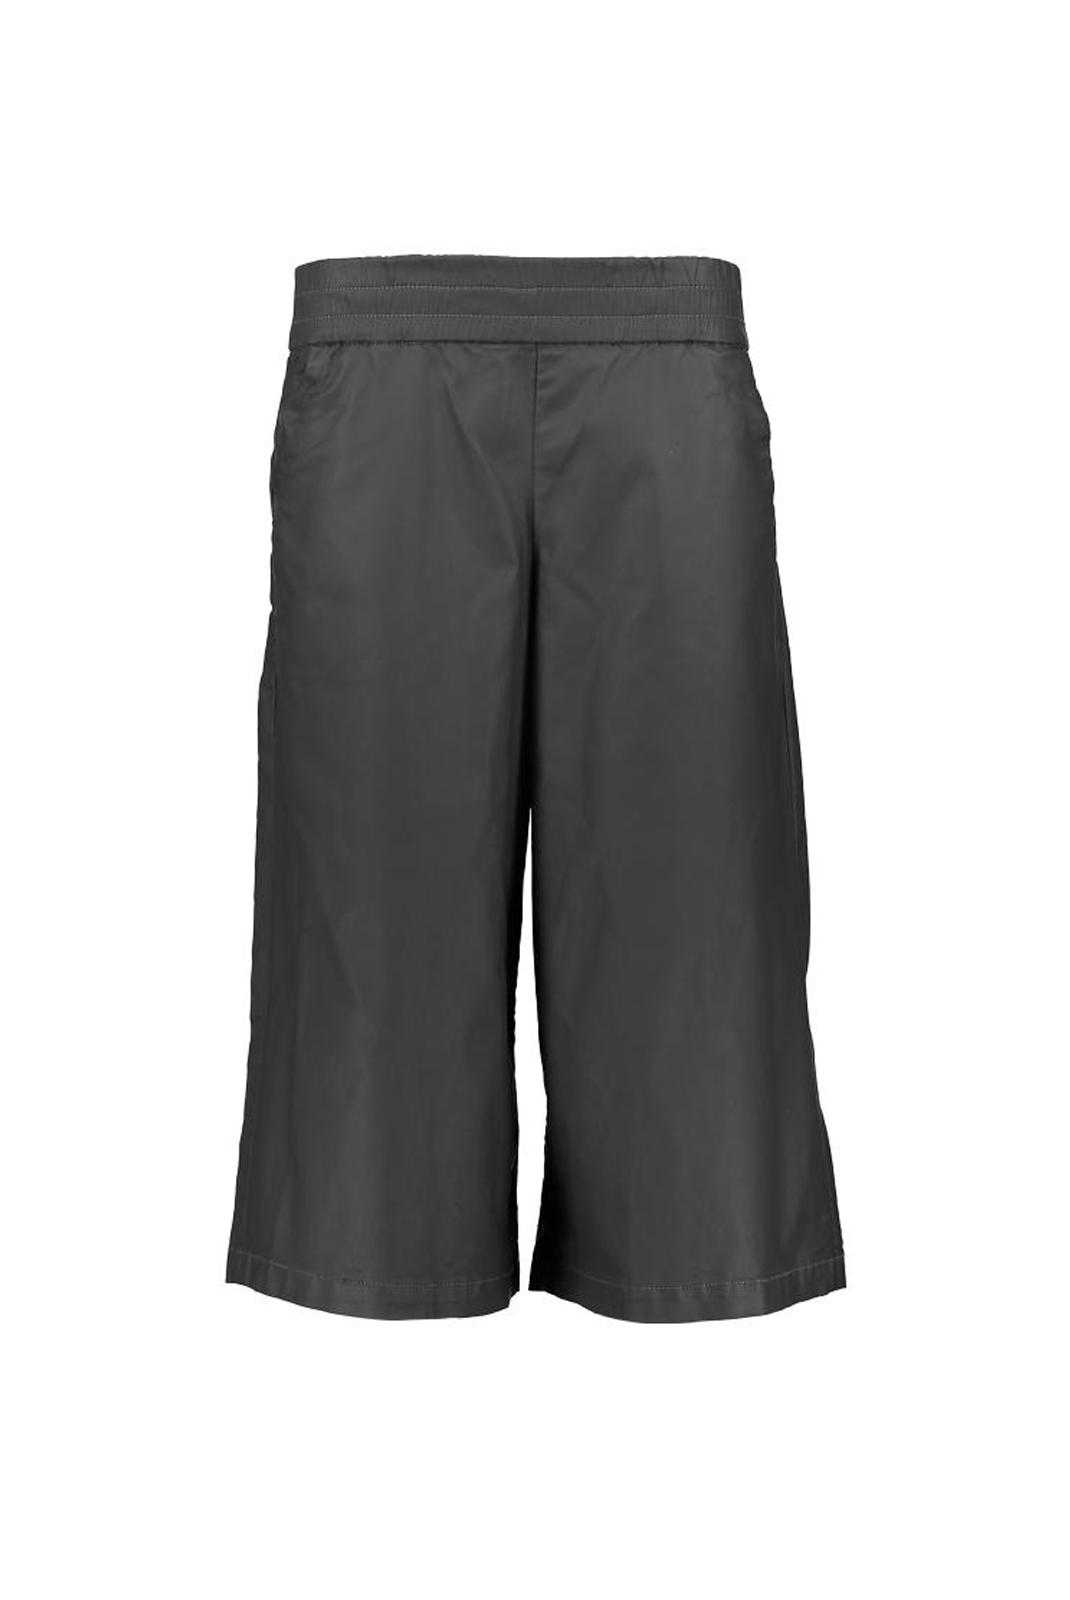 Pantalons  Pepe jeans PL800613 975